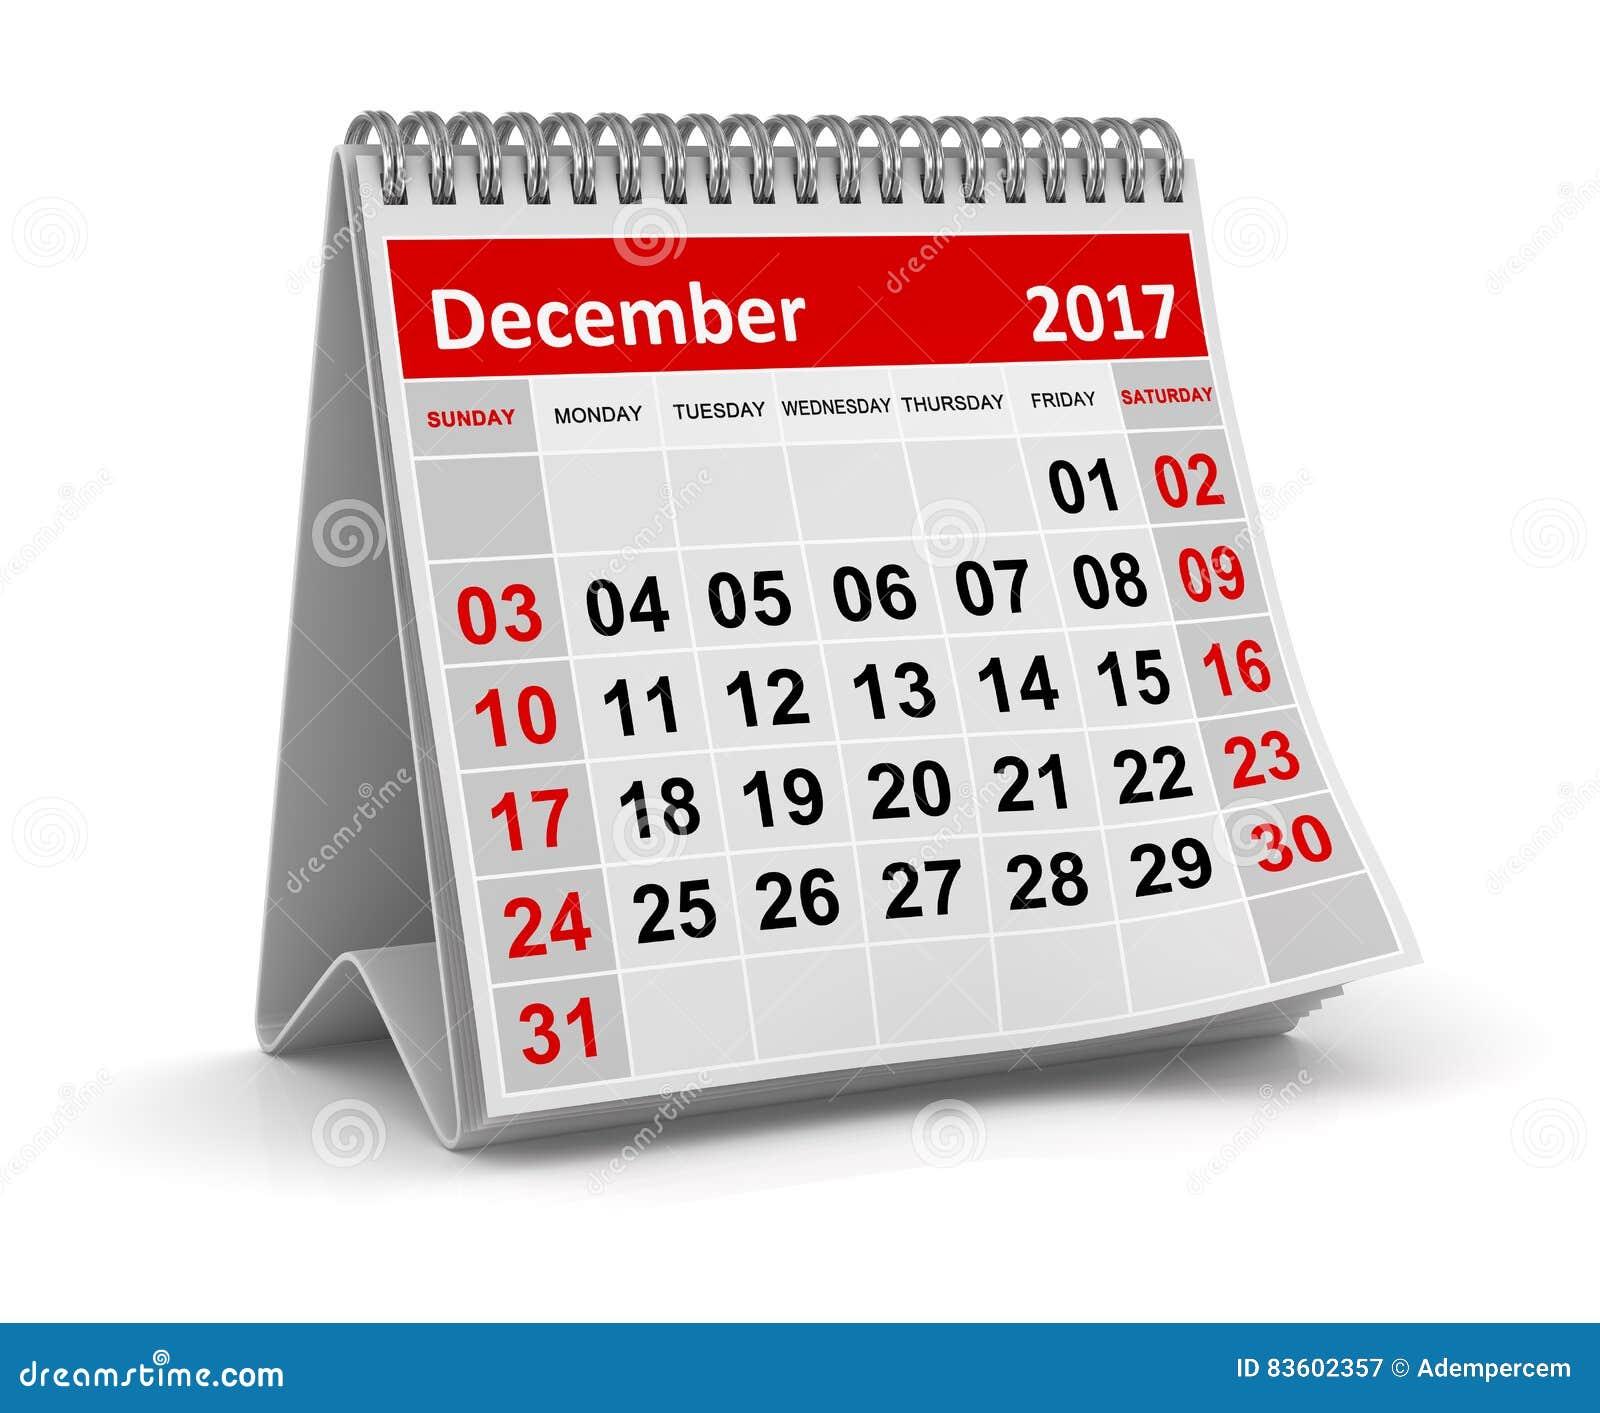 Calendar - December 2017